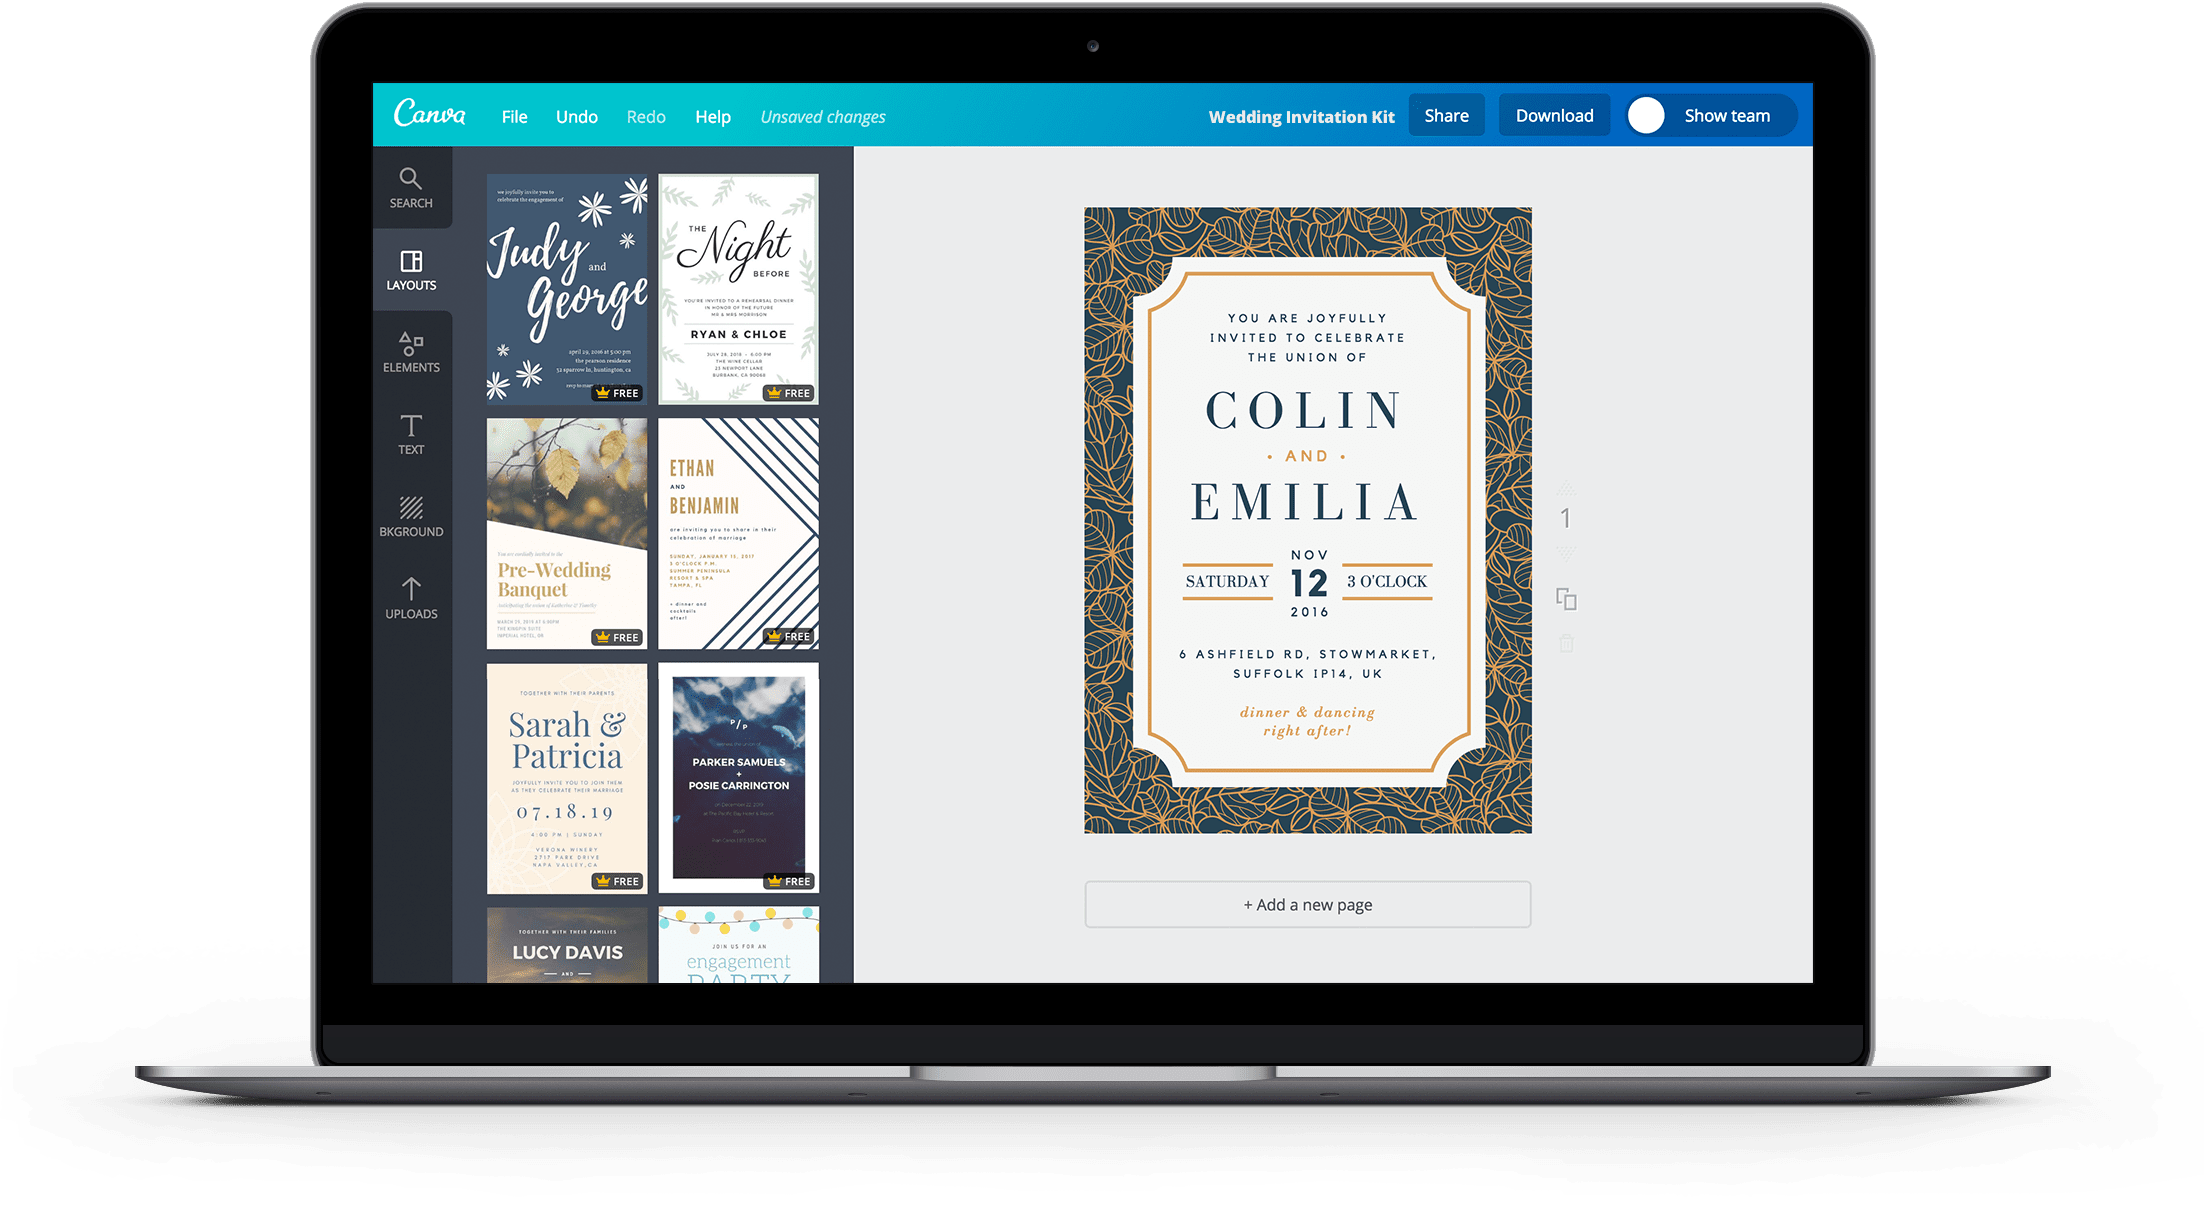 Free Online Wedding Invitation Kits Design Custom Wedding Kits In Canva